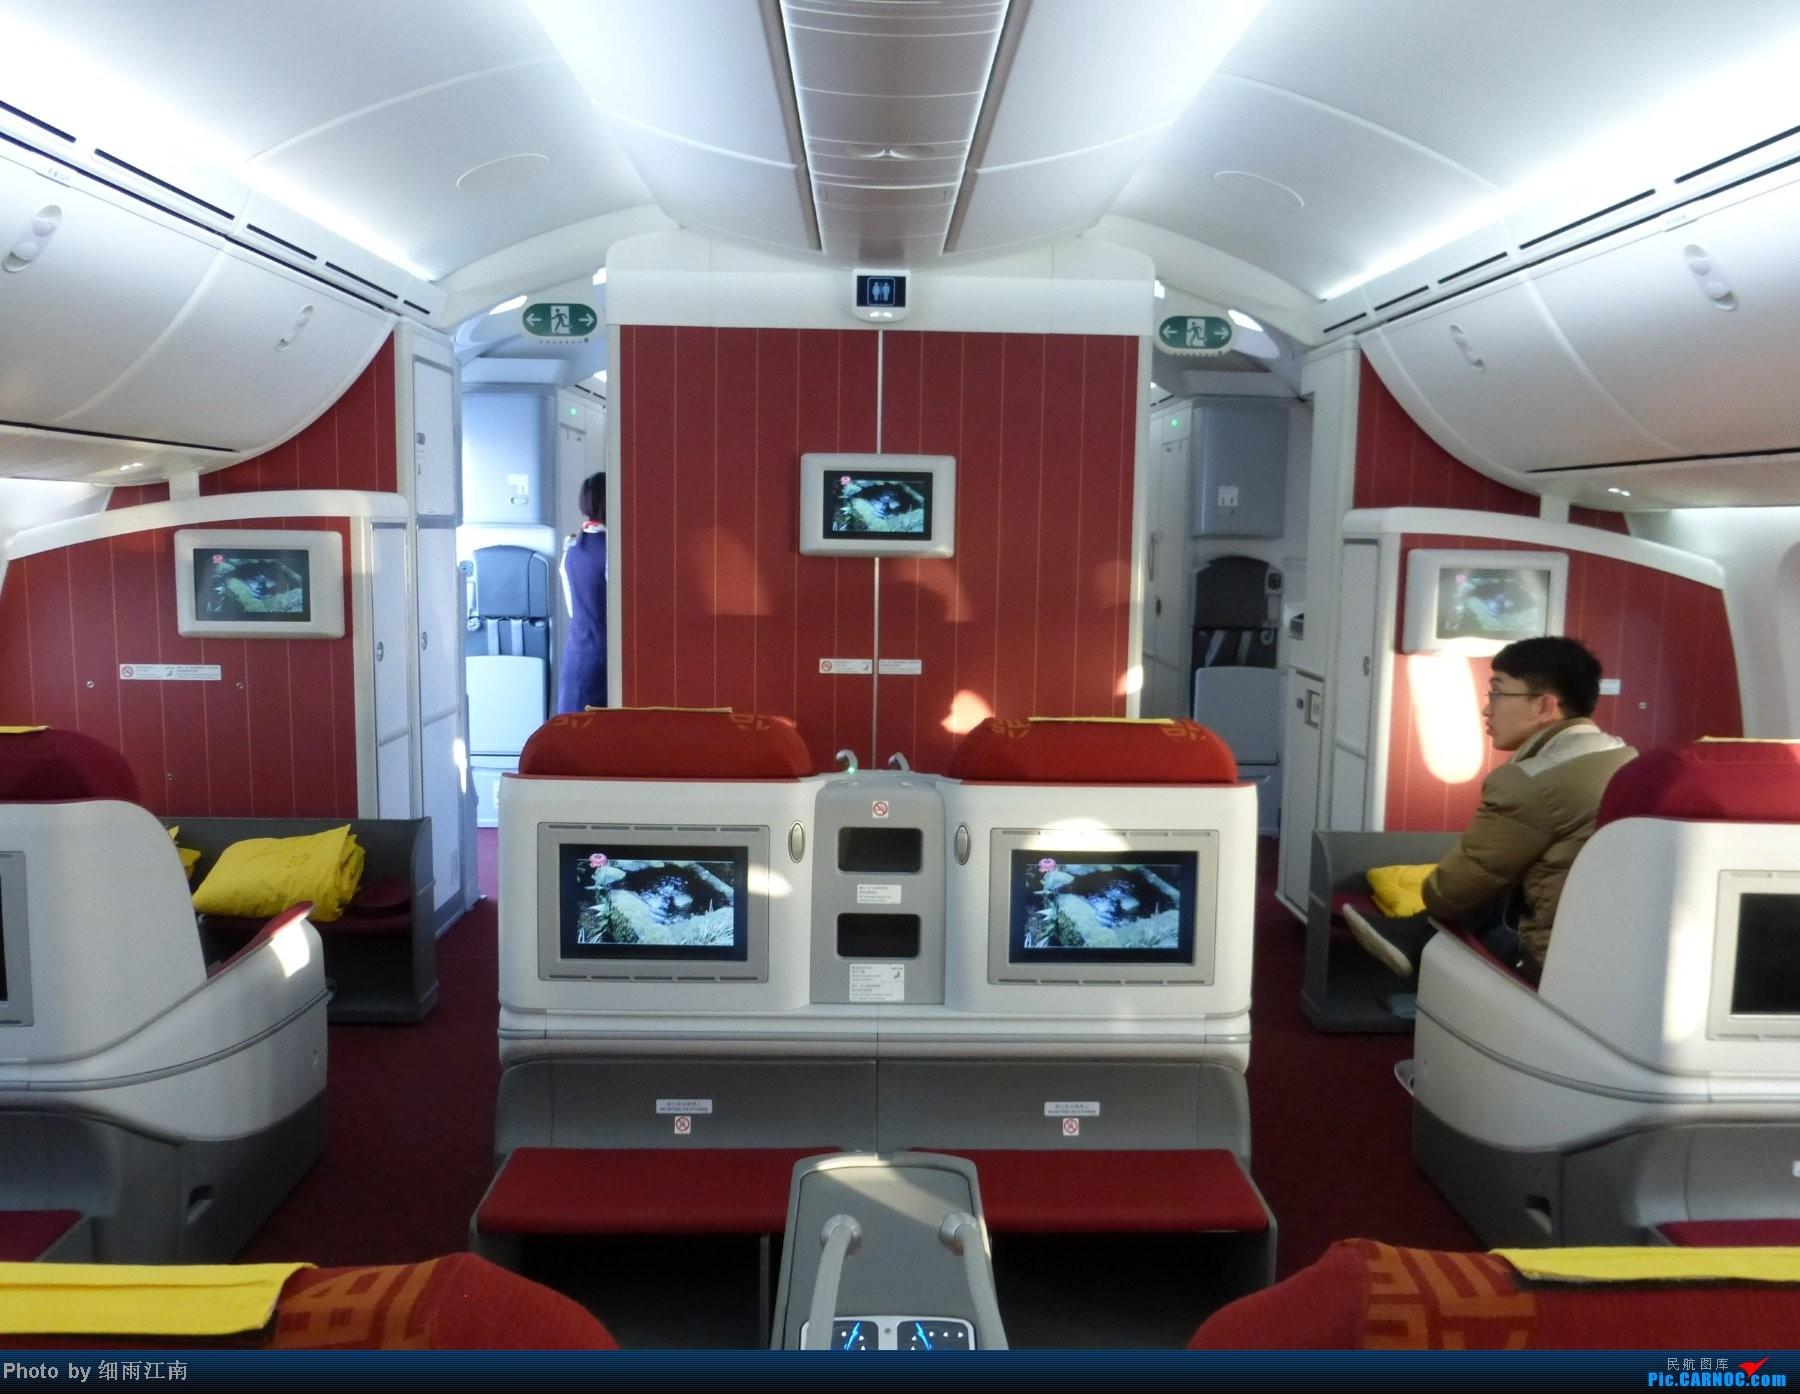 Re:[原创]2014年第一次飞行也是第一次坐787,北京飞虹桥 BOEING 787 B-2723 北京首都国际机场